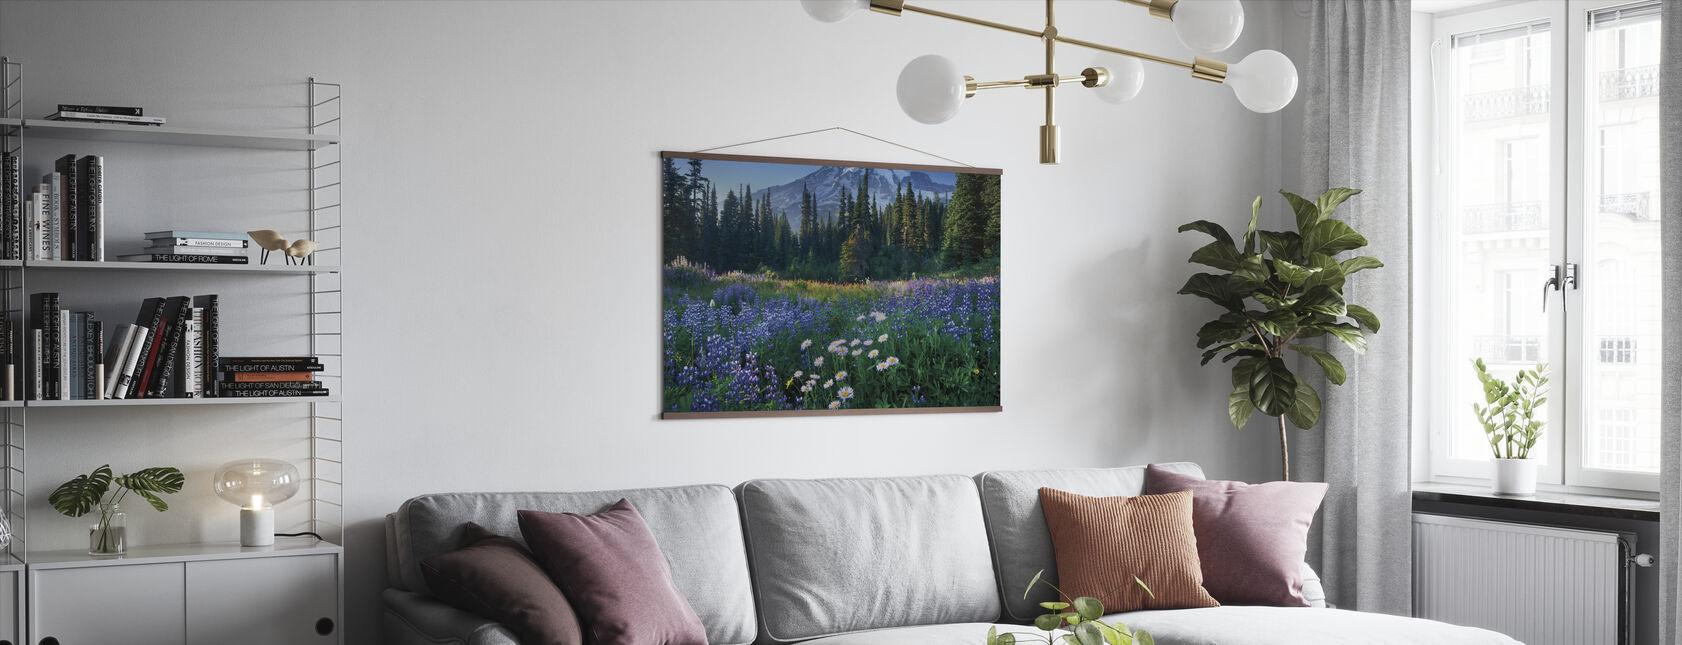 Mount Rainier - Plakat - Stue